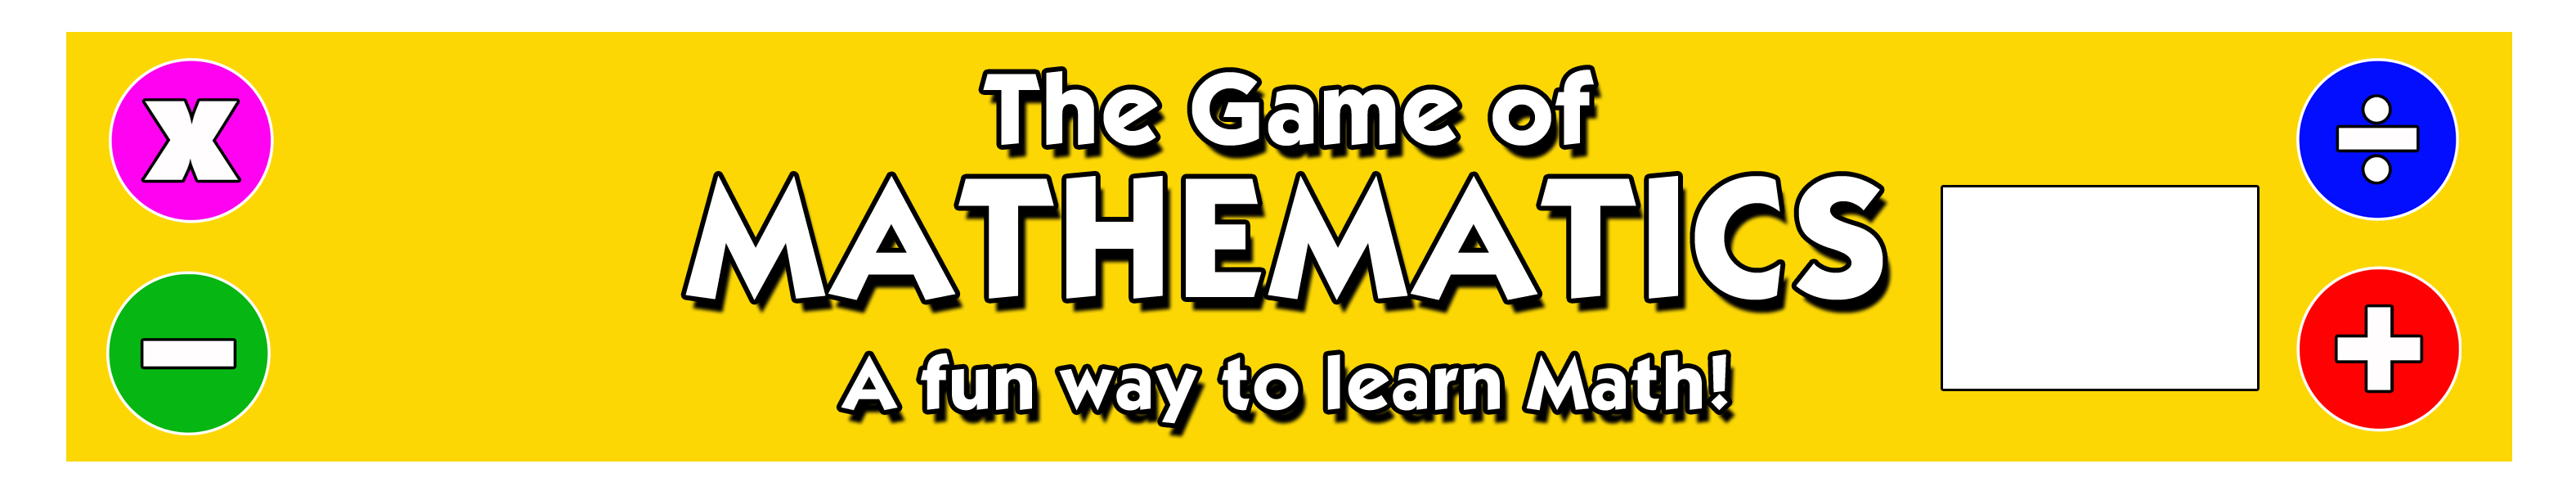 game_of_mathematics-frontpanel